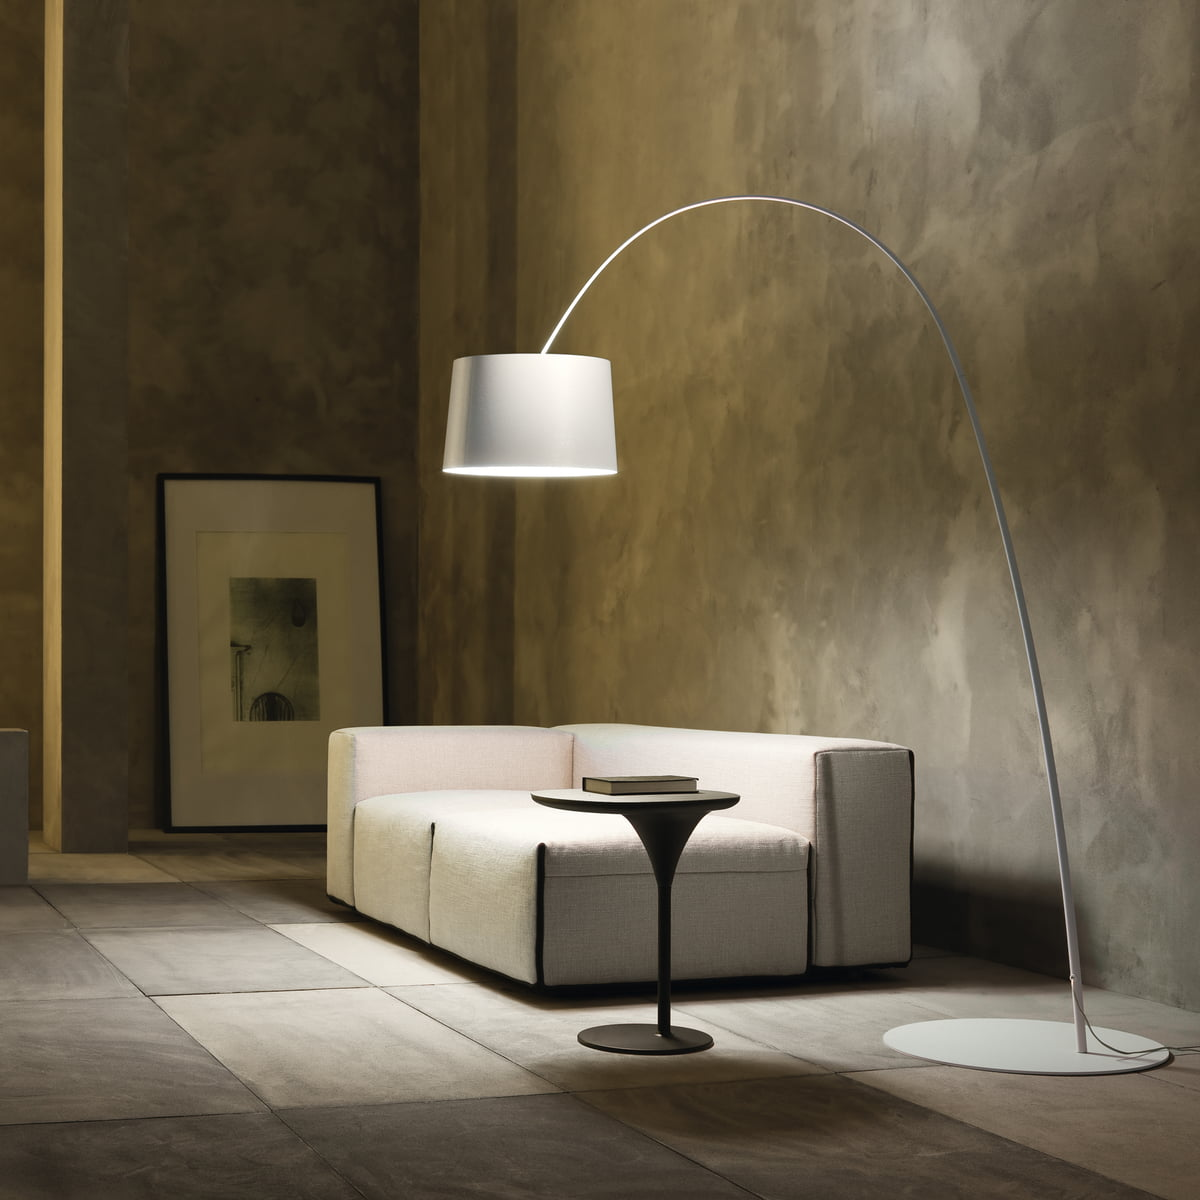 Twiggy Gooseneck Lamp by Foscarini